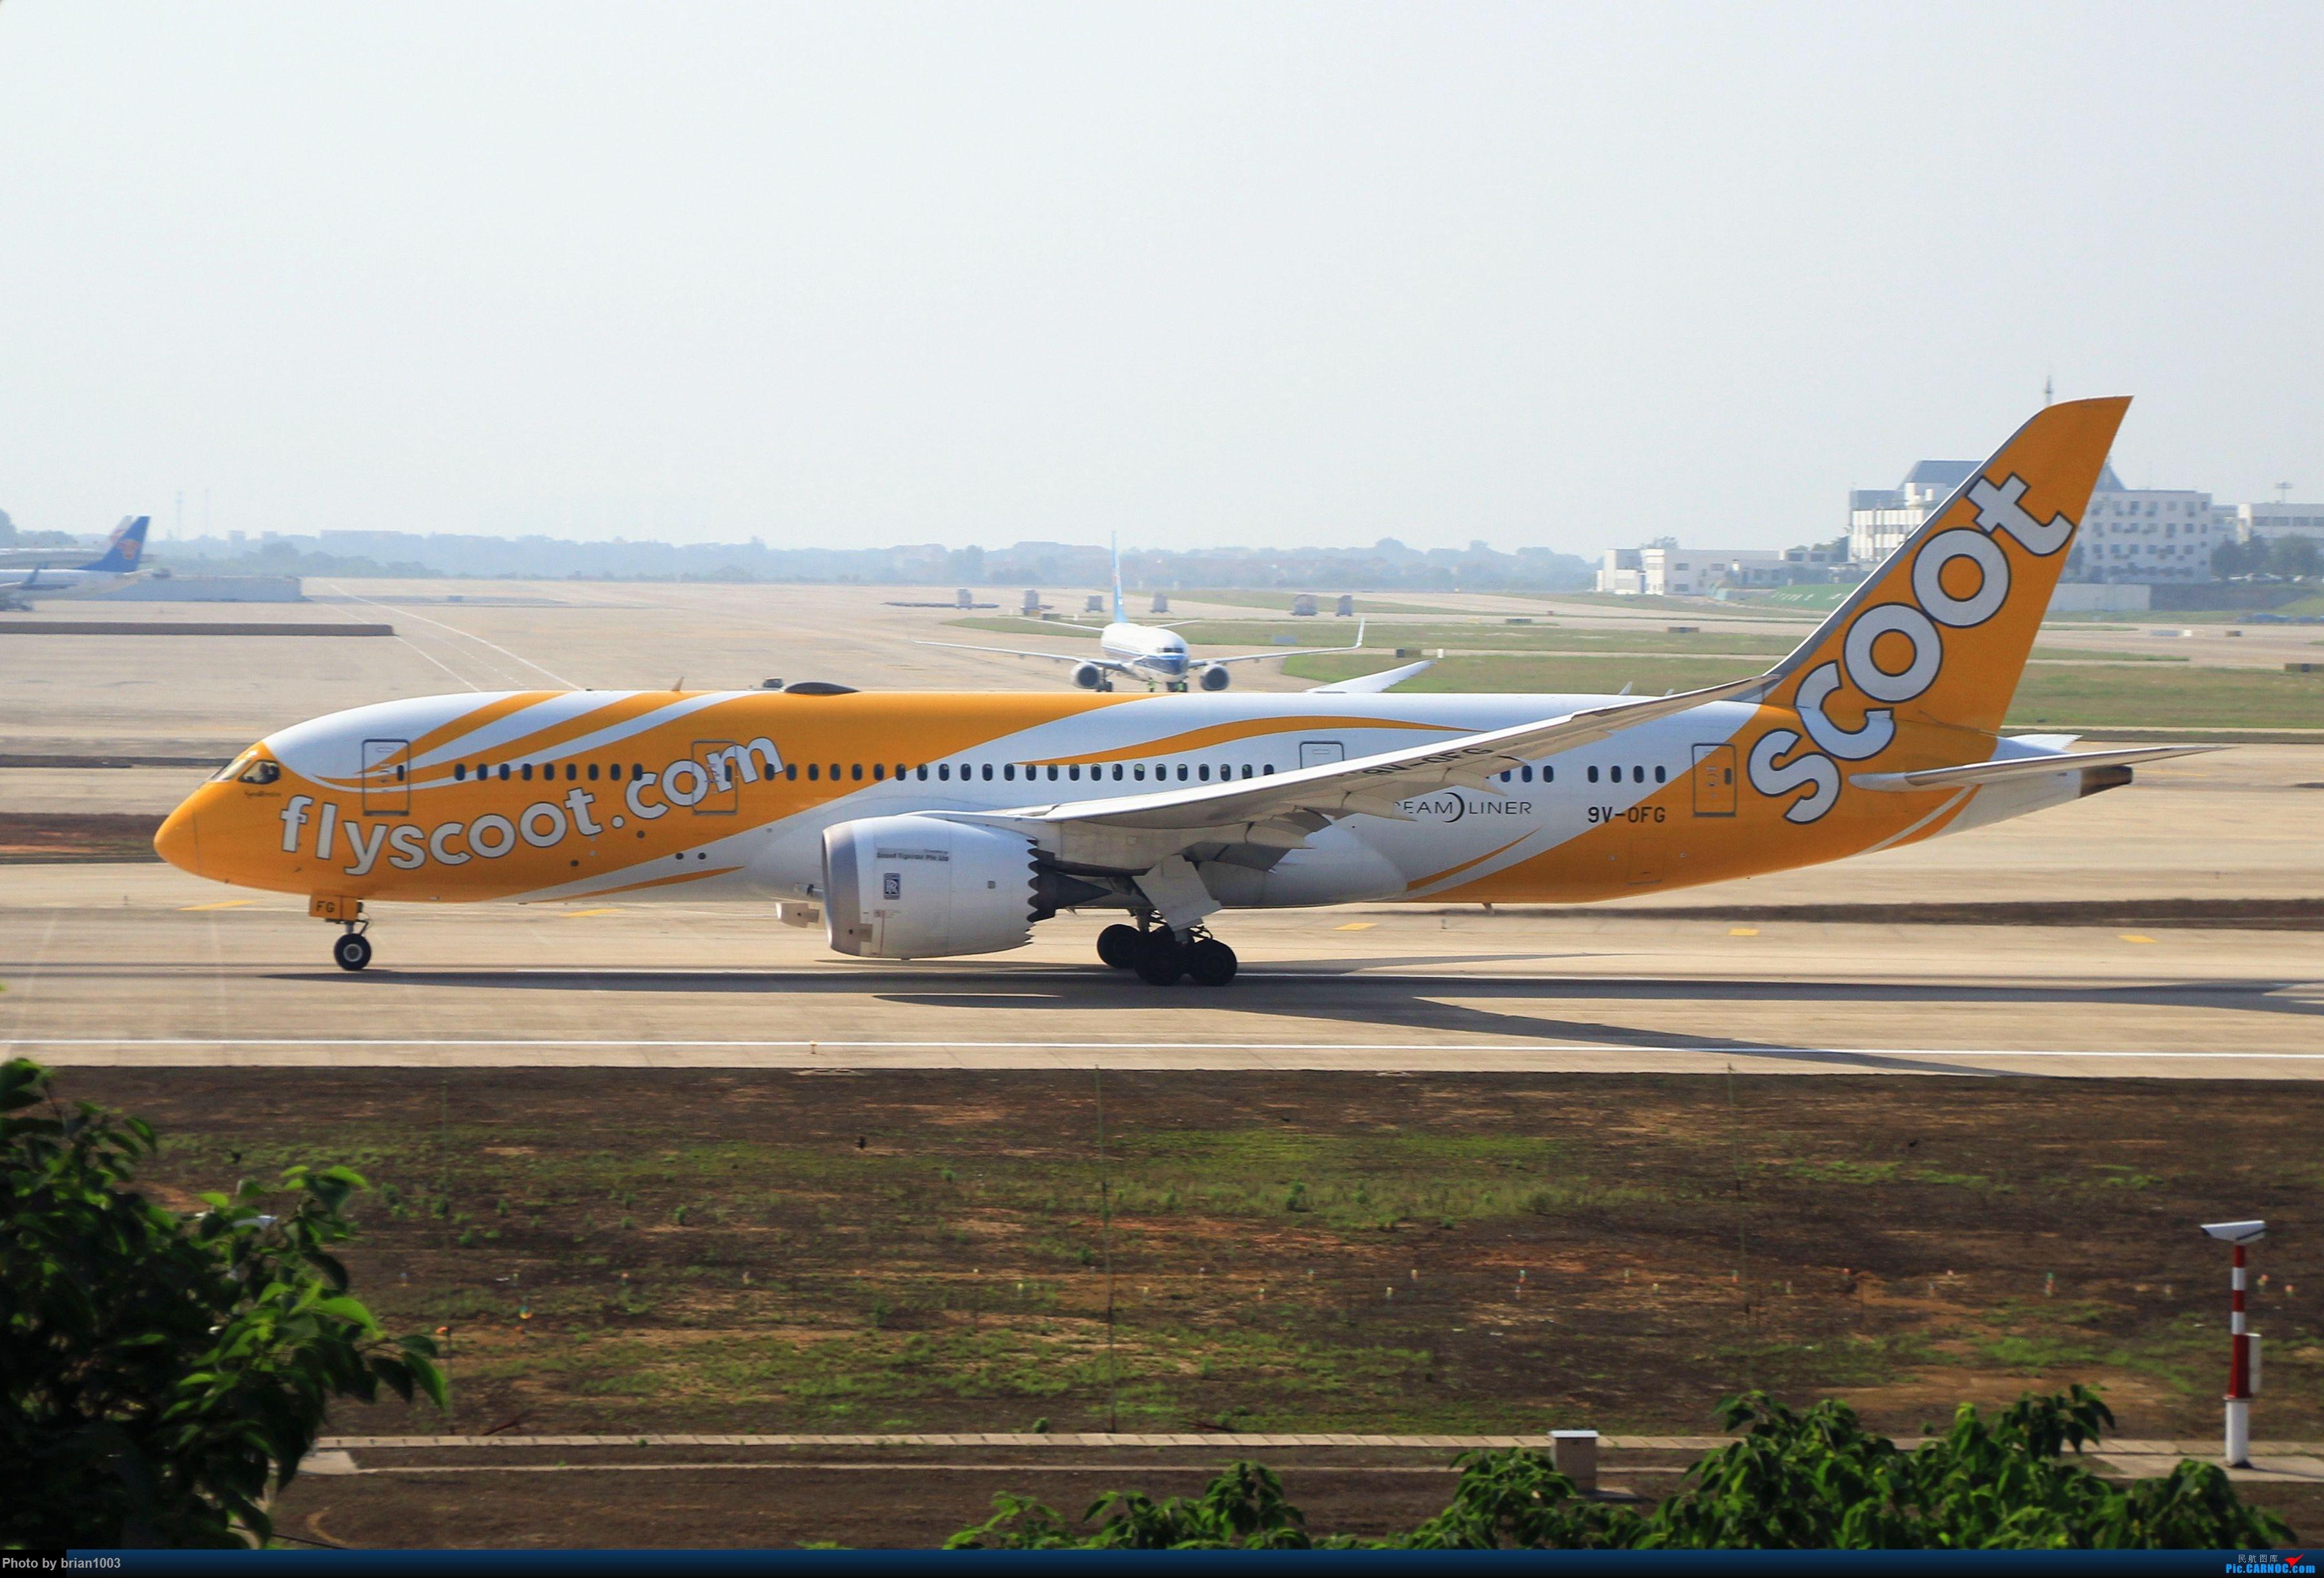 Re:[原创]WUH武汉天河机场拍机之喜迎酷航788和偶遇某其他飞机 BOEING 787-8 9V-0FG WUH